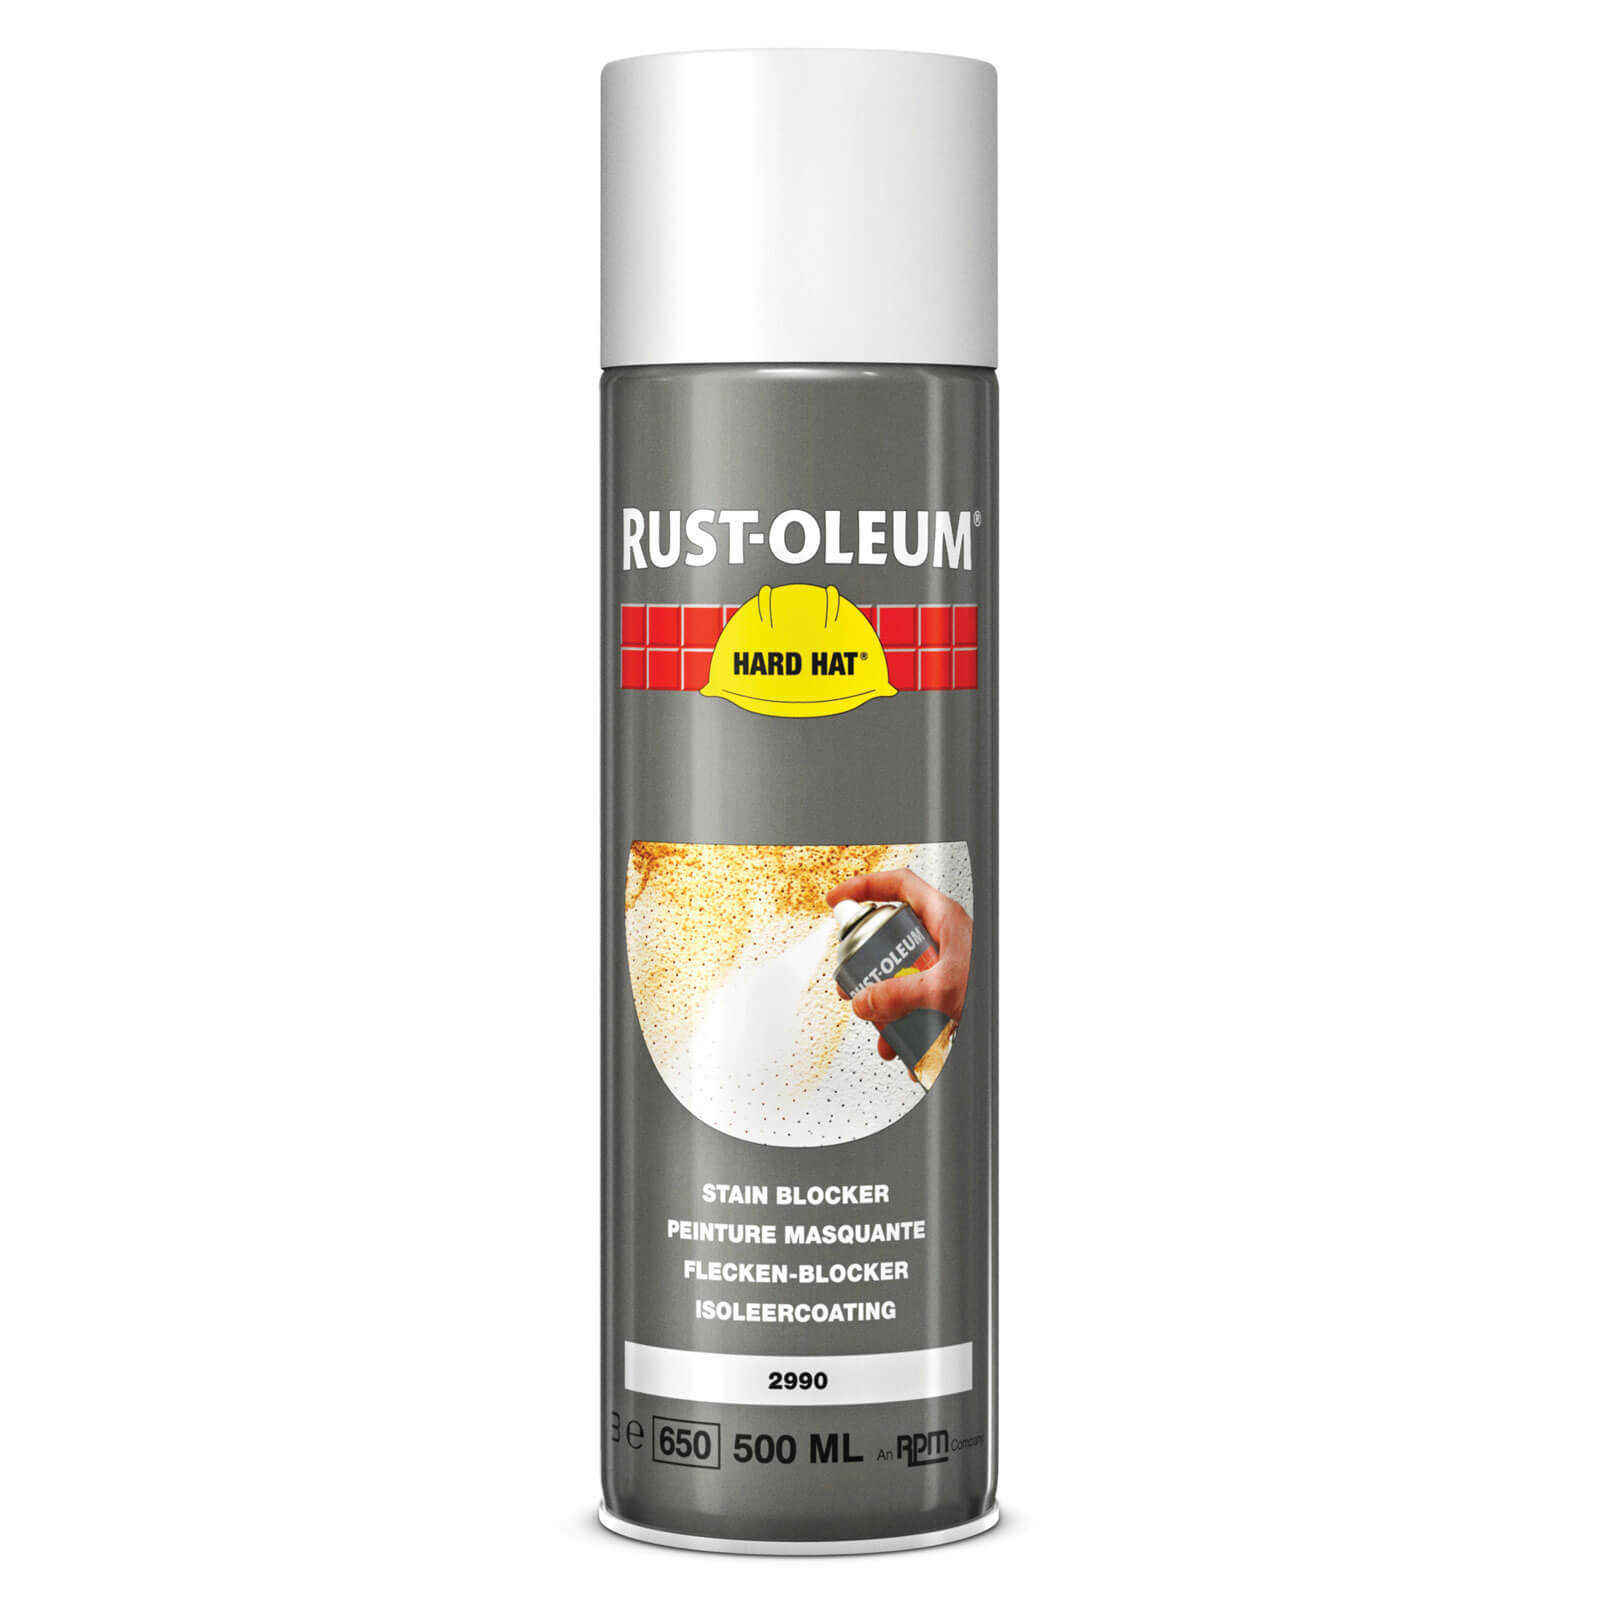 Image of Rust Oleum 2990 Stain Blocker Matt Spray Paint White 500ml